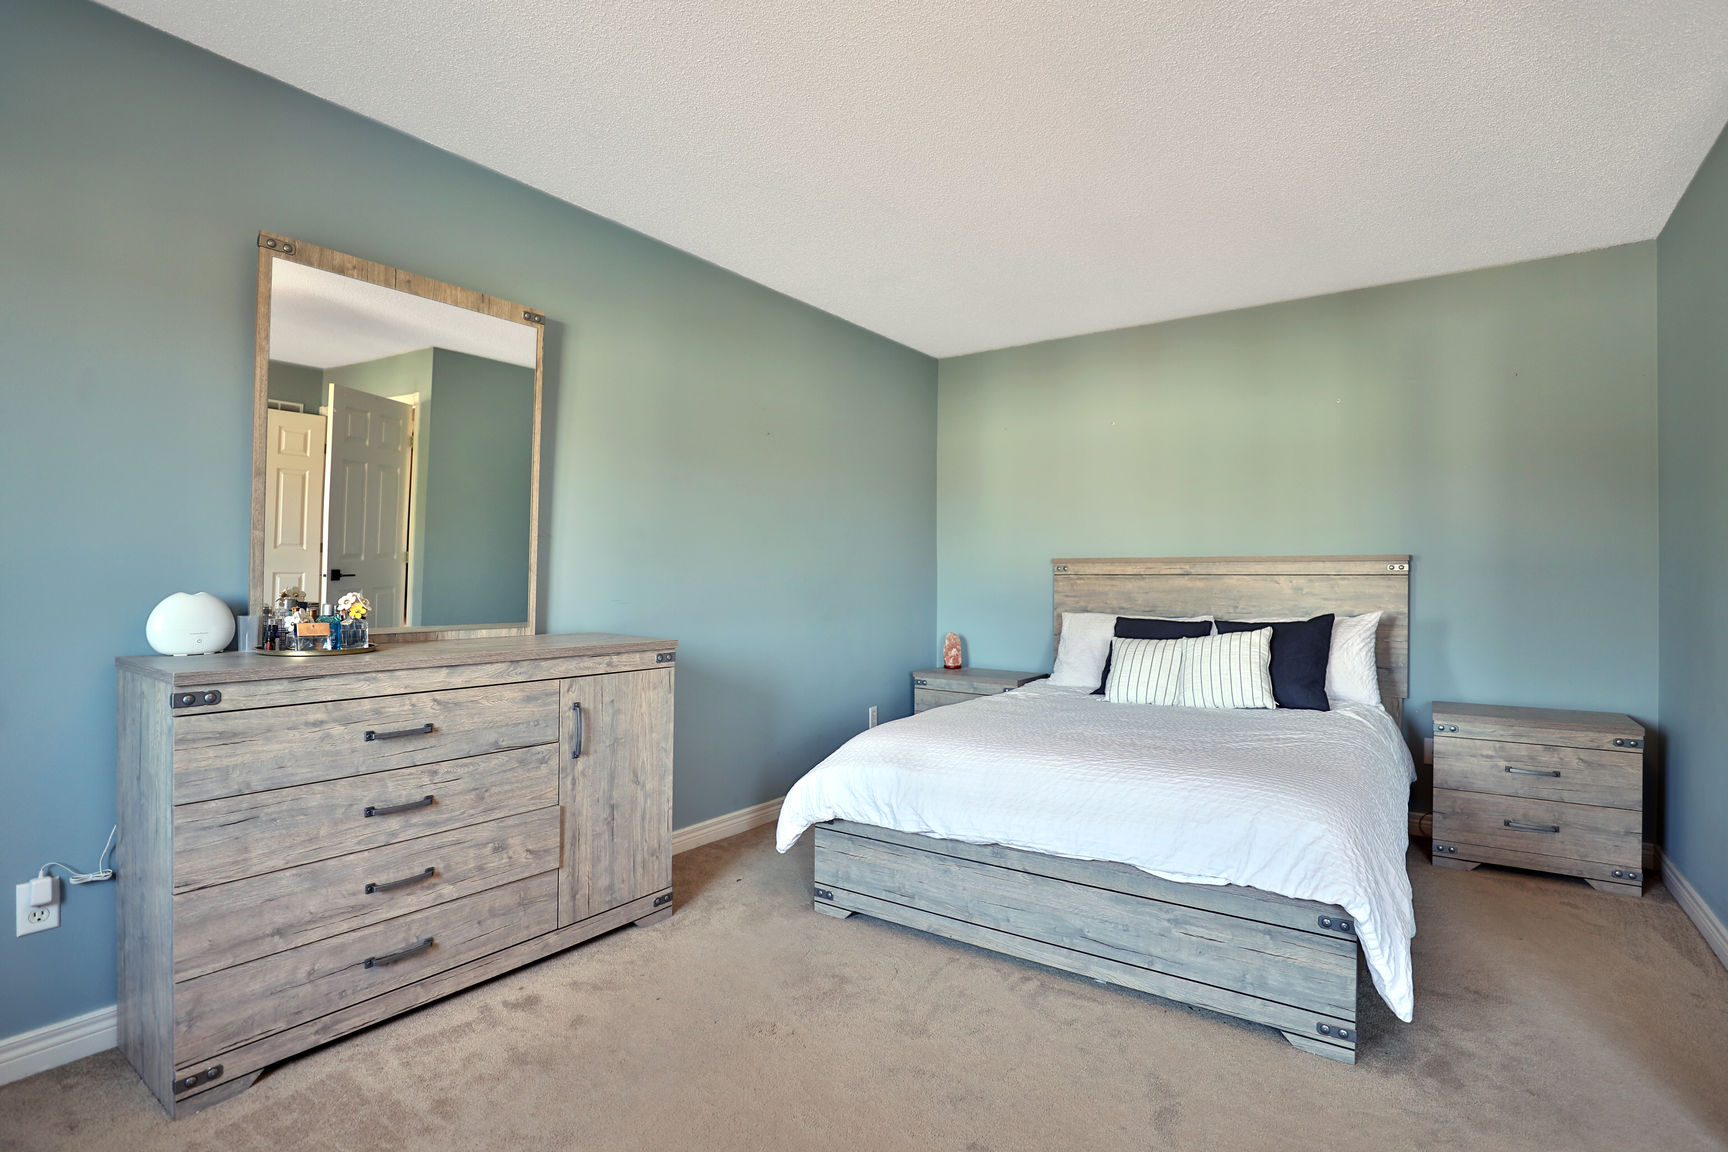 Glanbrook Binbrook 26 Switzer master bedroom 2 2 - Recently SOLD in Binbrook